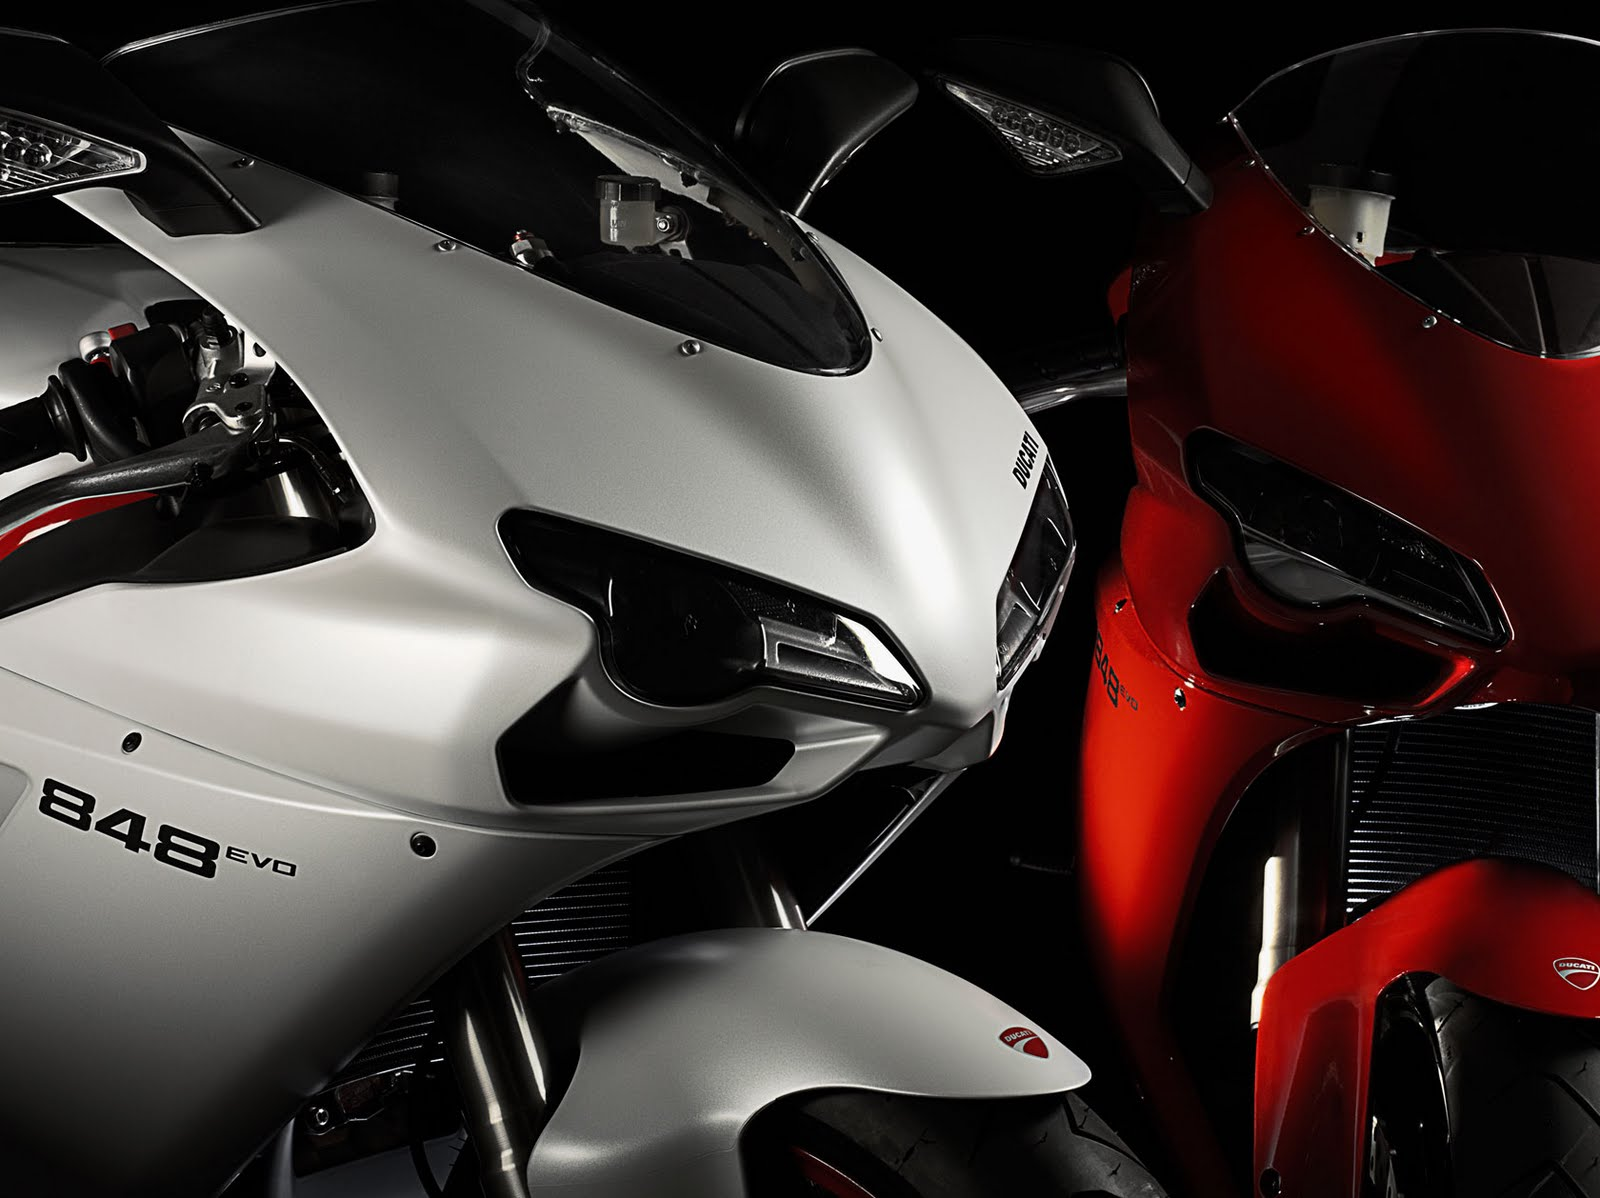 http://3.bp.blogspot.com/-w9KYz78gfSU/TeKSNGbfjvI/AAAAAAAAAYo/793M8qOXJnM/s1600/2011-Ducati-848-EVO-Headlight.jpg